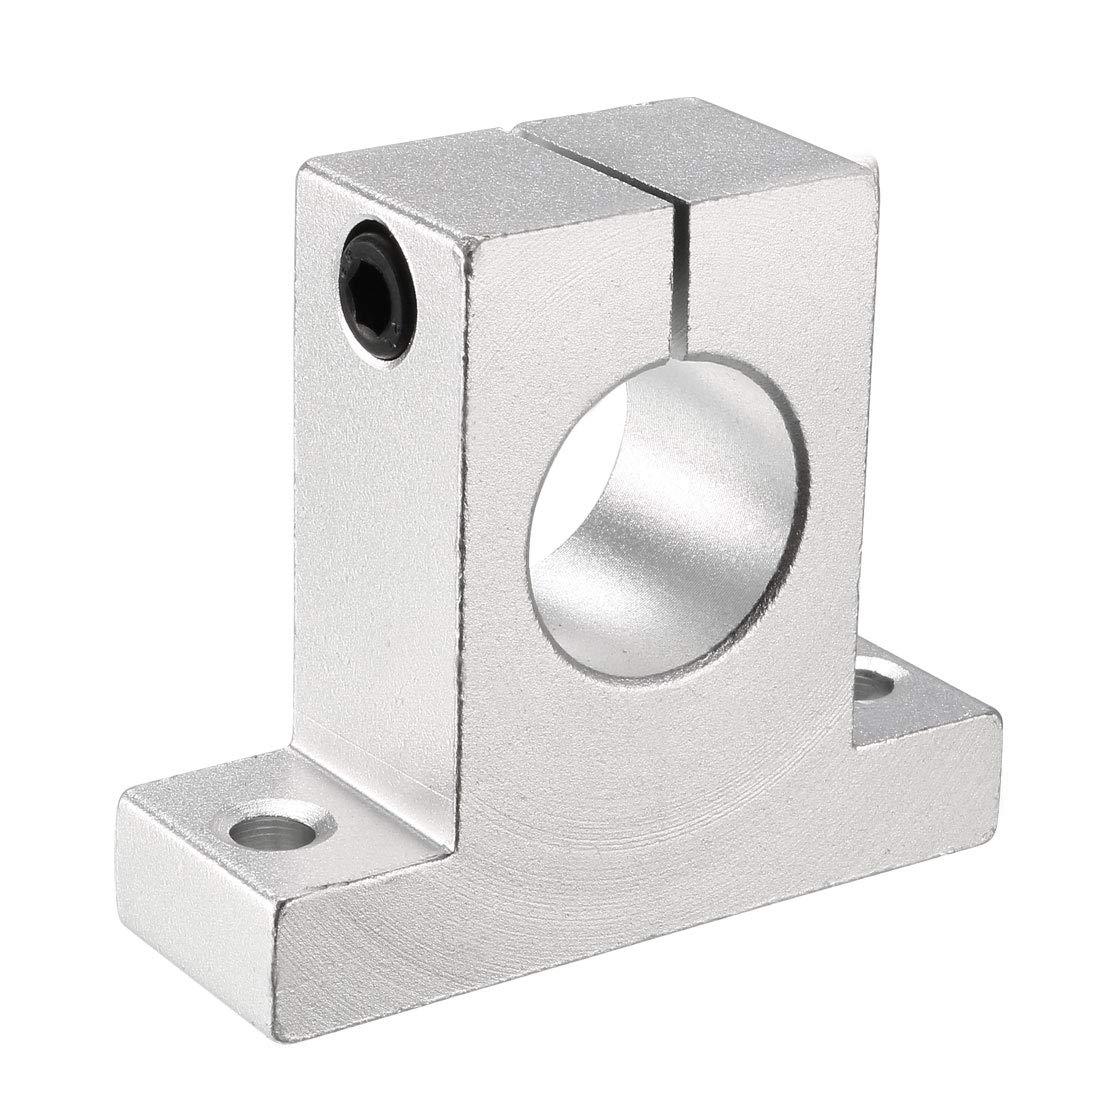 10mm Outer Diameter VXB Brand LMH10UU 10mm Flanged Ball Bushing CNC Linear Motion 10x19x29mm Type 19mm Flanged Linear Motion Ball Bushing Inner Diameter